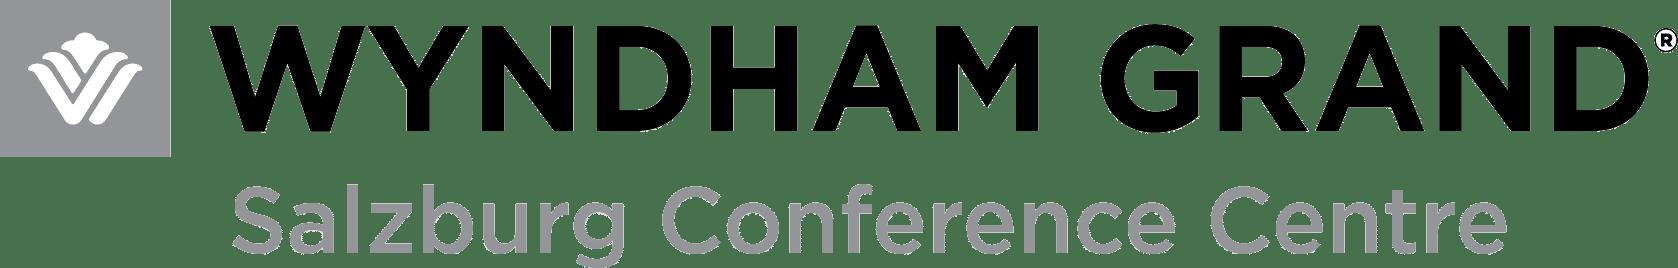 Wyndham Grand Salzburg Conference Centre Hotel Logo